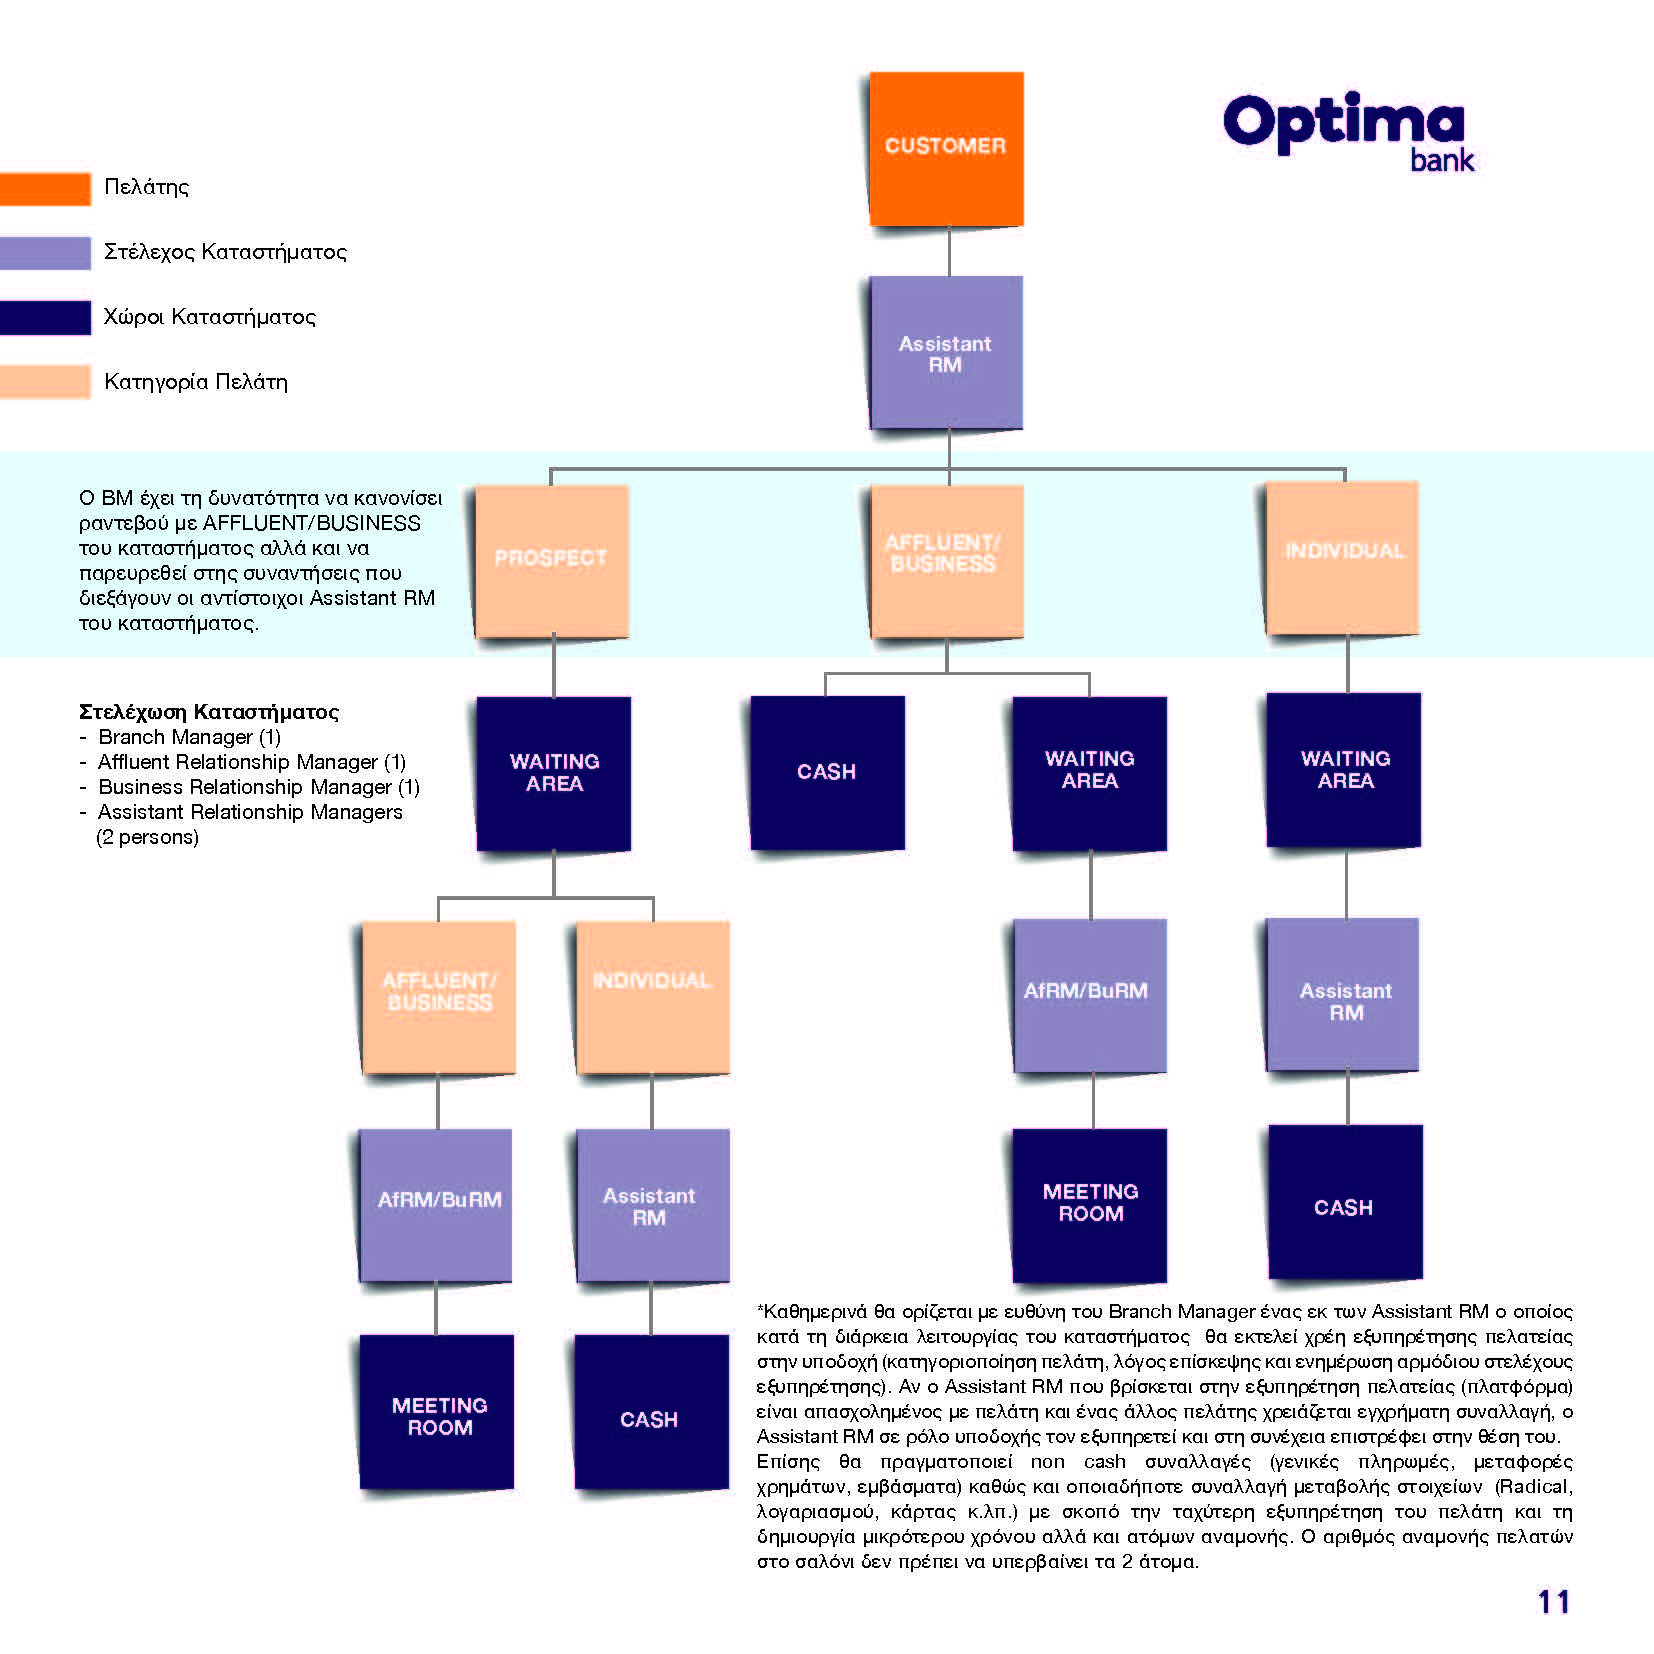 https://www.jib.gr/wp-content/uploads/2020/09/OPTIMA-BANK-BOOKLET-WEB_Page_011.jpg